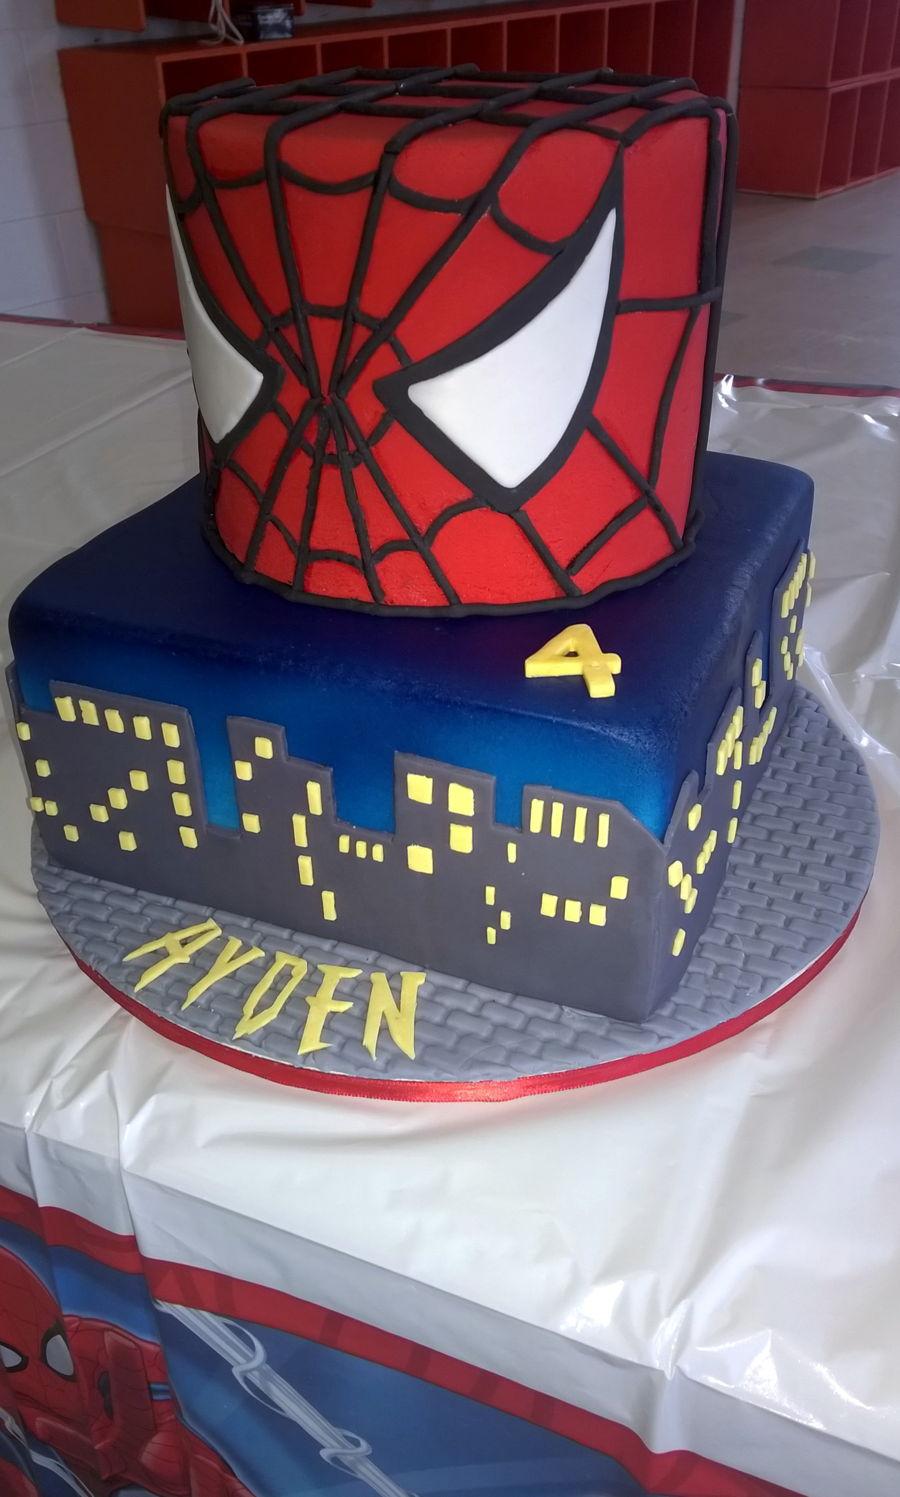 Spiderman Face Cake Design : Spiderman Face Cake - CakeCentral.com